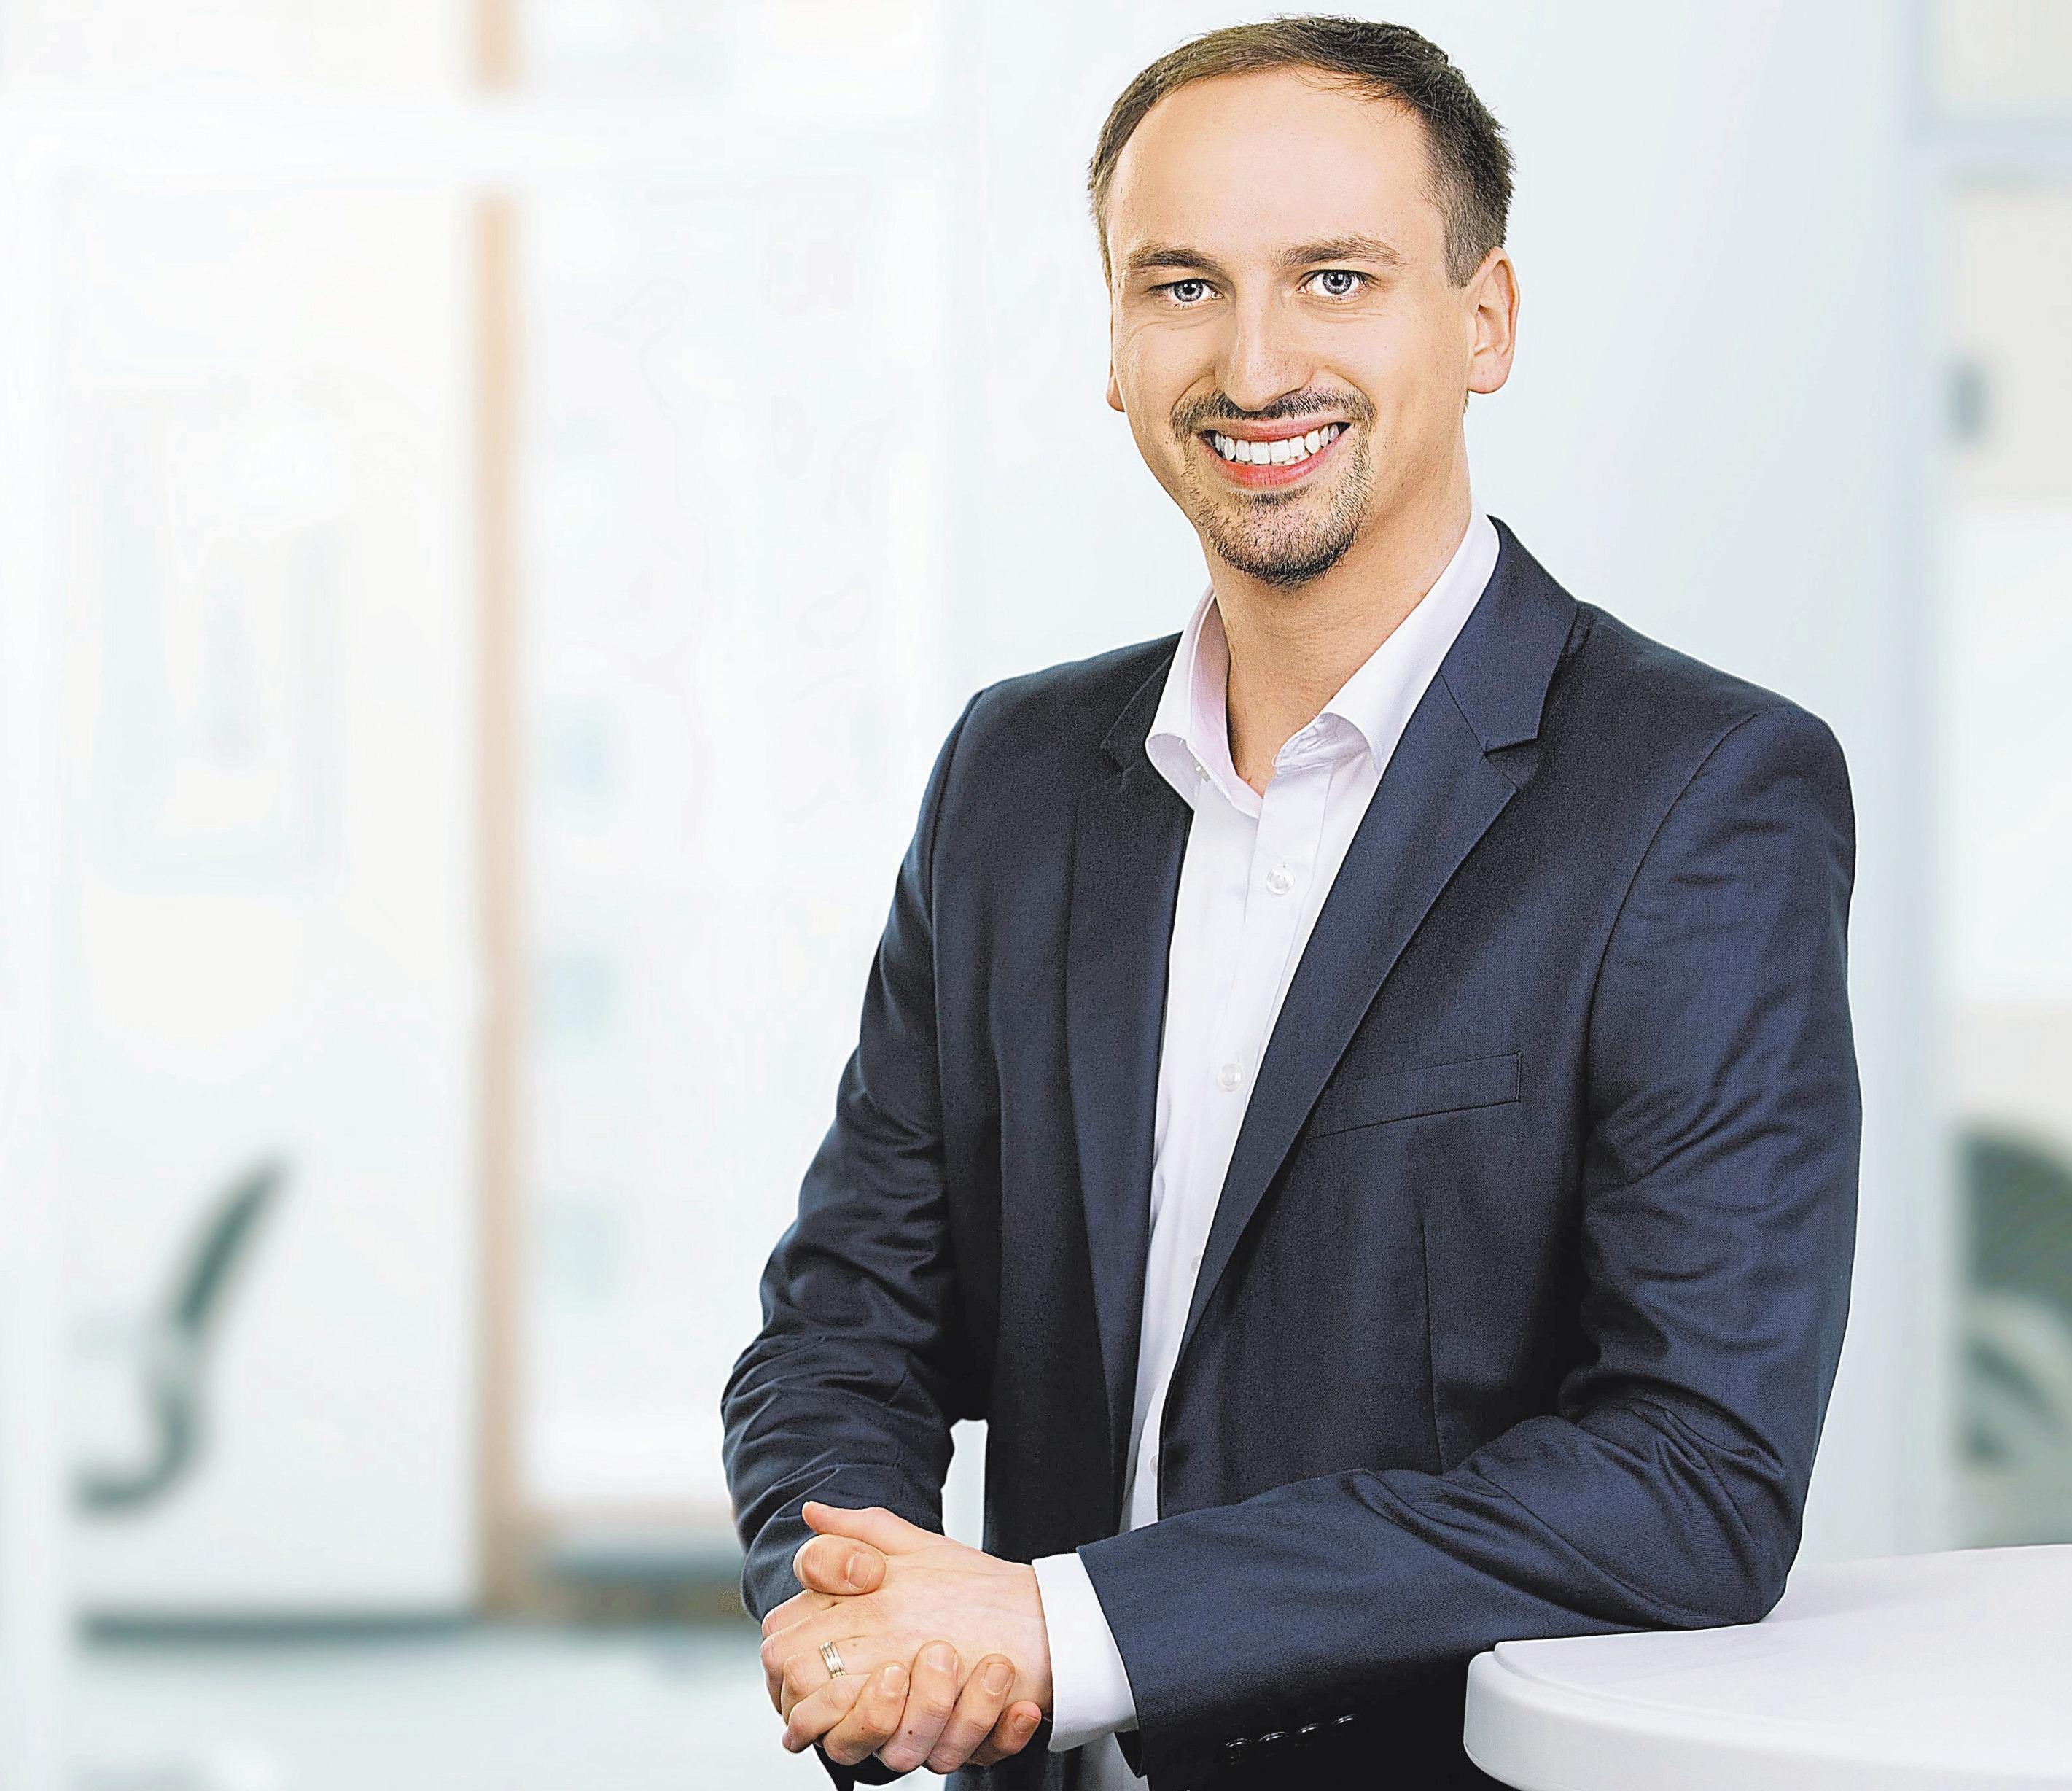 Sven Thiveßen ist jetzt nach erfolgreich abgeschlossener Ausbildung Softwareentwickler bei GuideCom.  Foto: GuideCom